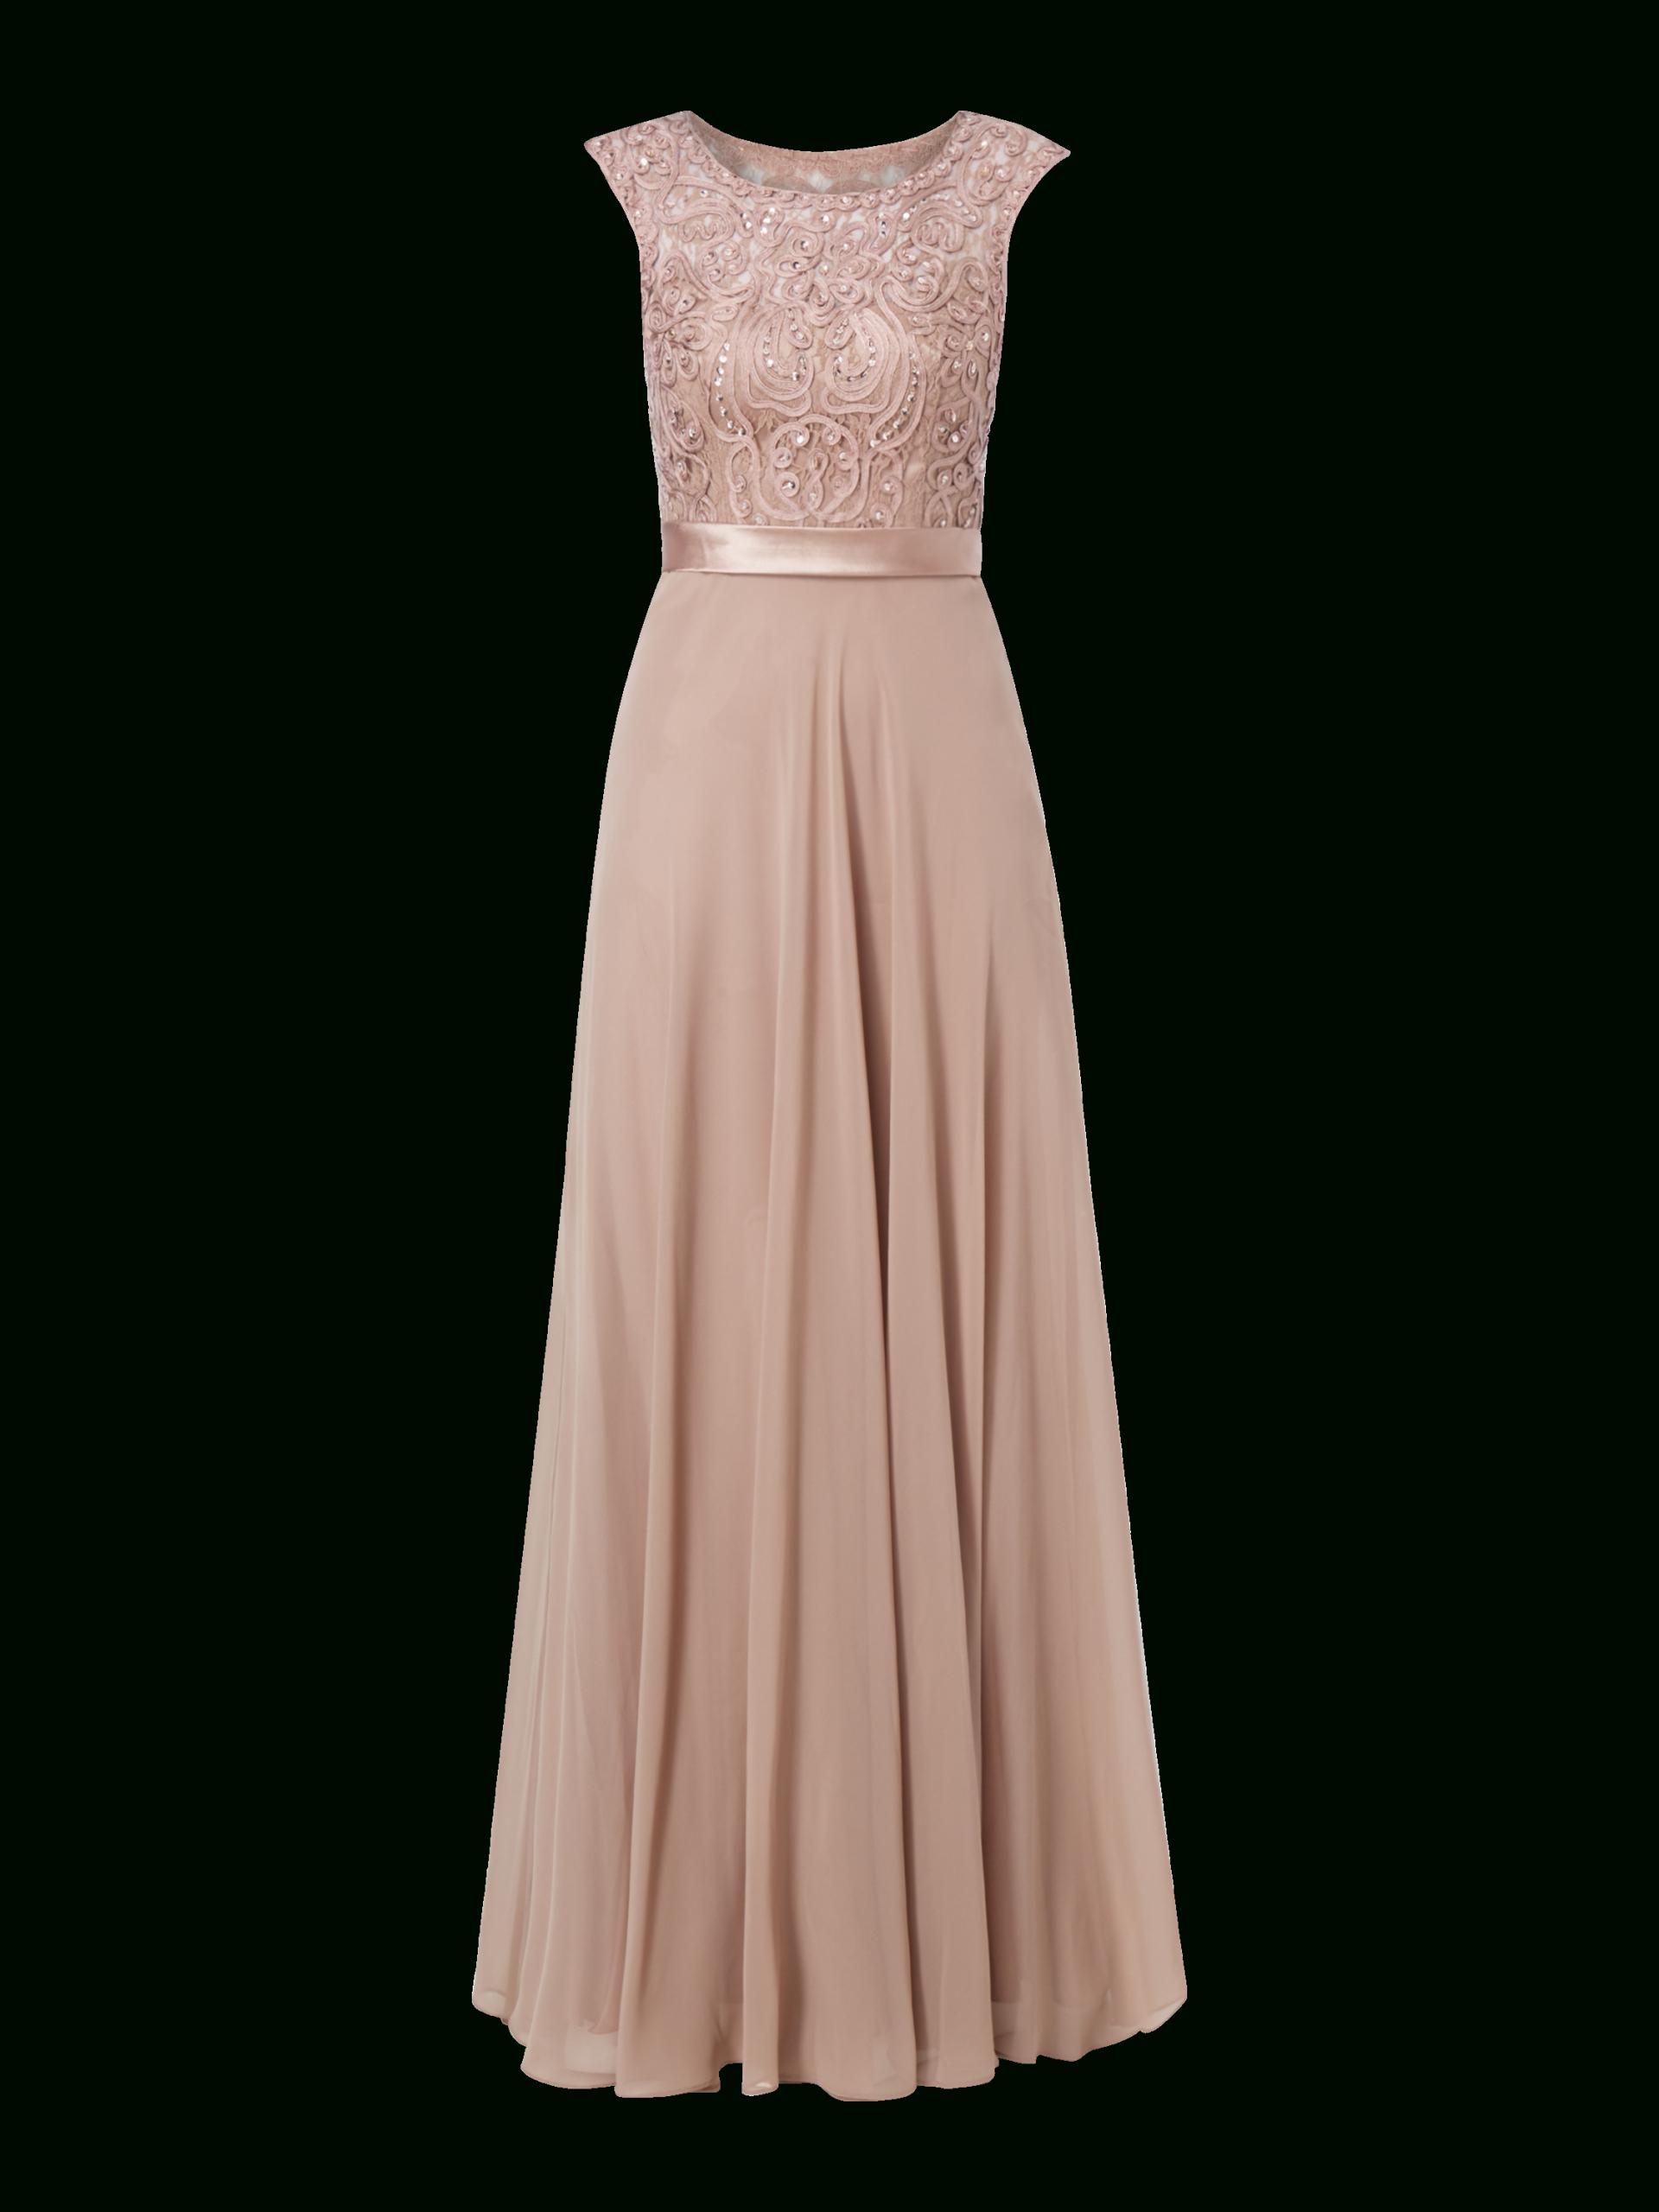 Designer Genial P&C Abendkleider Niente Design15 Spektakulär P&C Abendkleider Niente Design